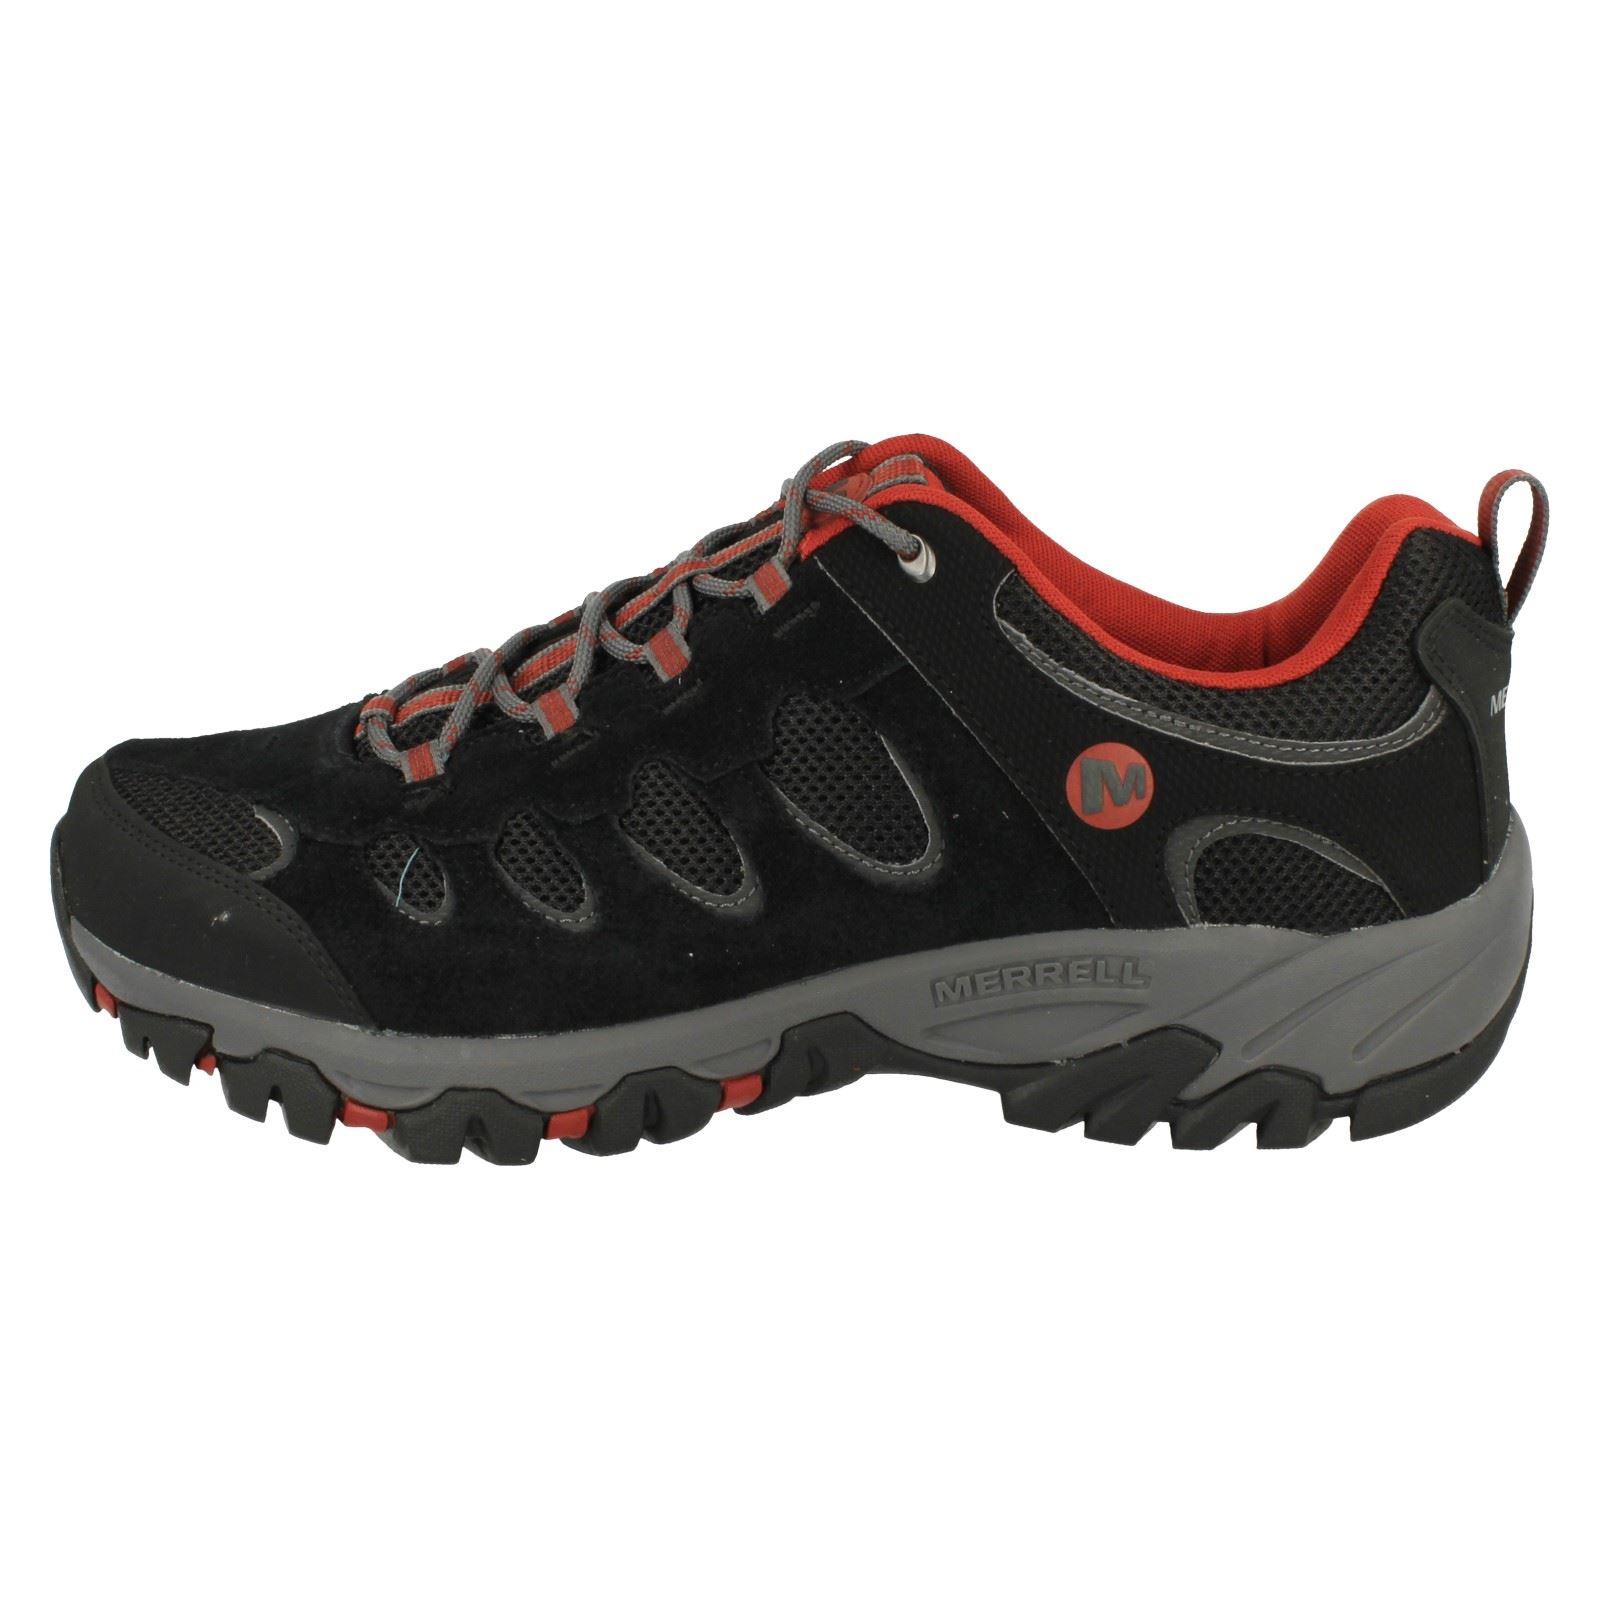 Mens Merrell Walking Trainers Trainers Trainers - Ridge Pass ae5f25